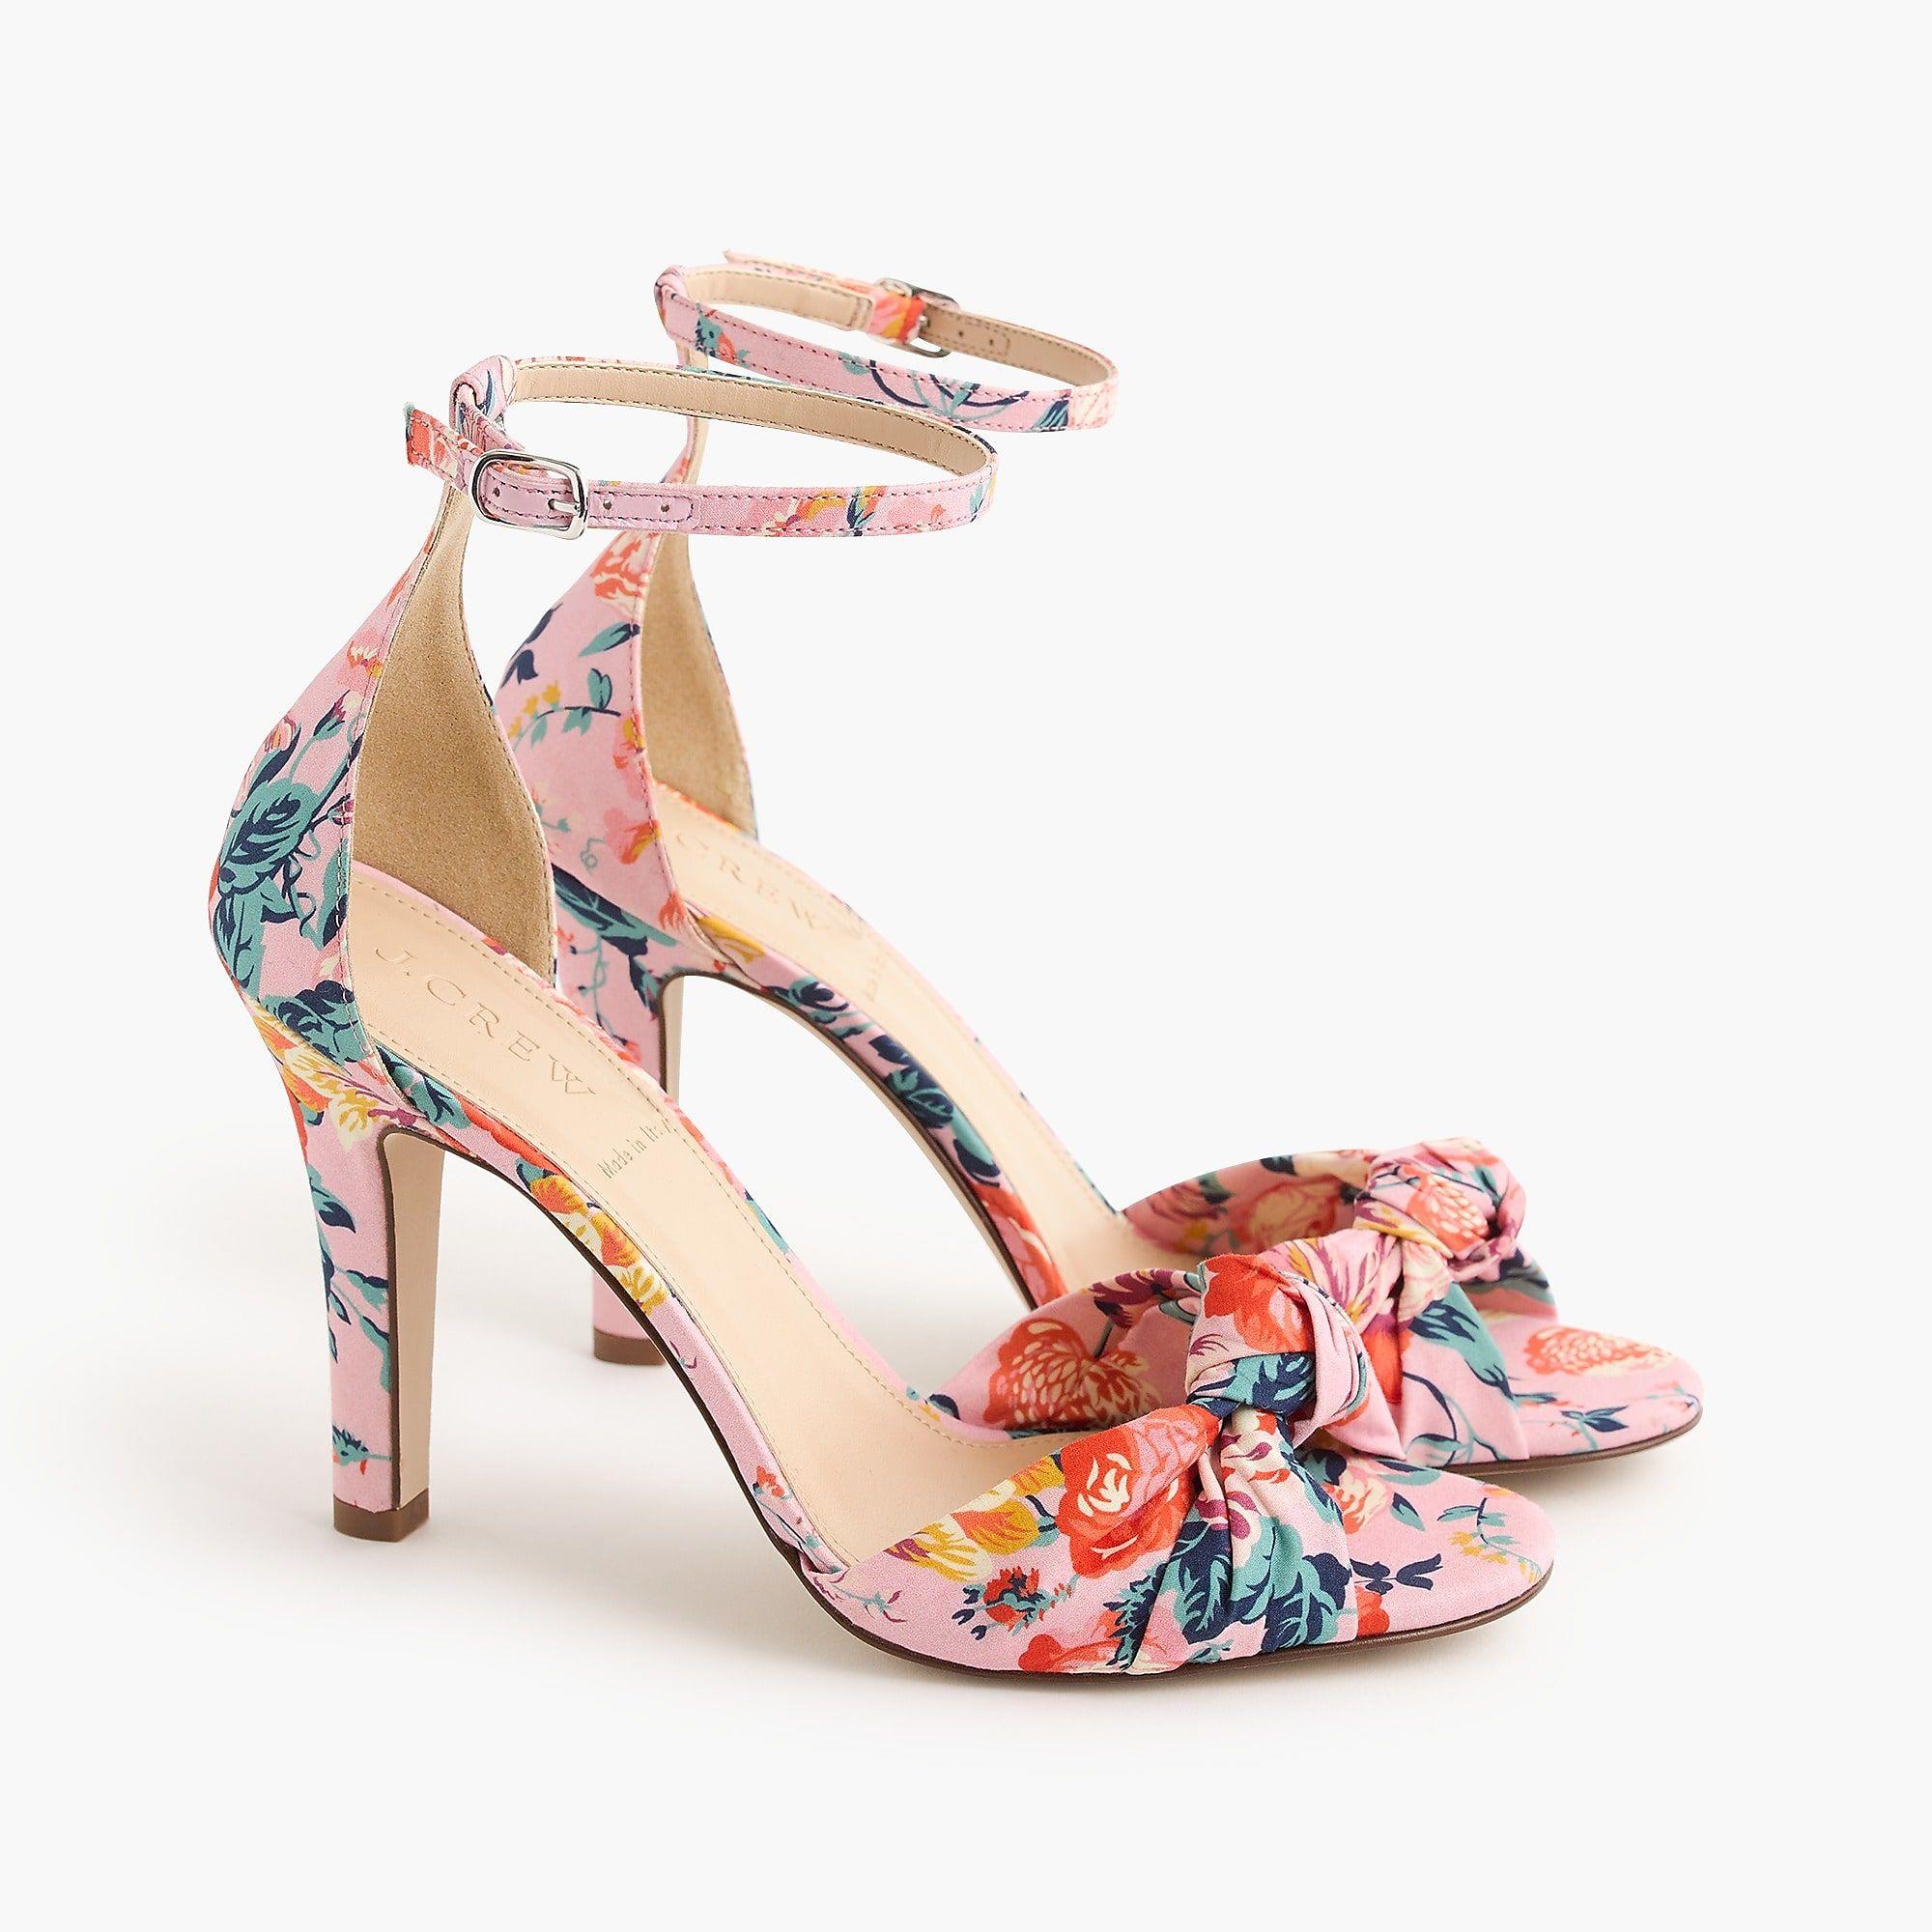 de1d91f5bfac Women s Knotted High-Heel Sandals In Liberty® Floral - Women s Sandals